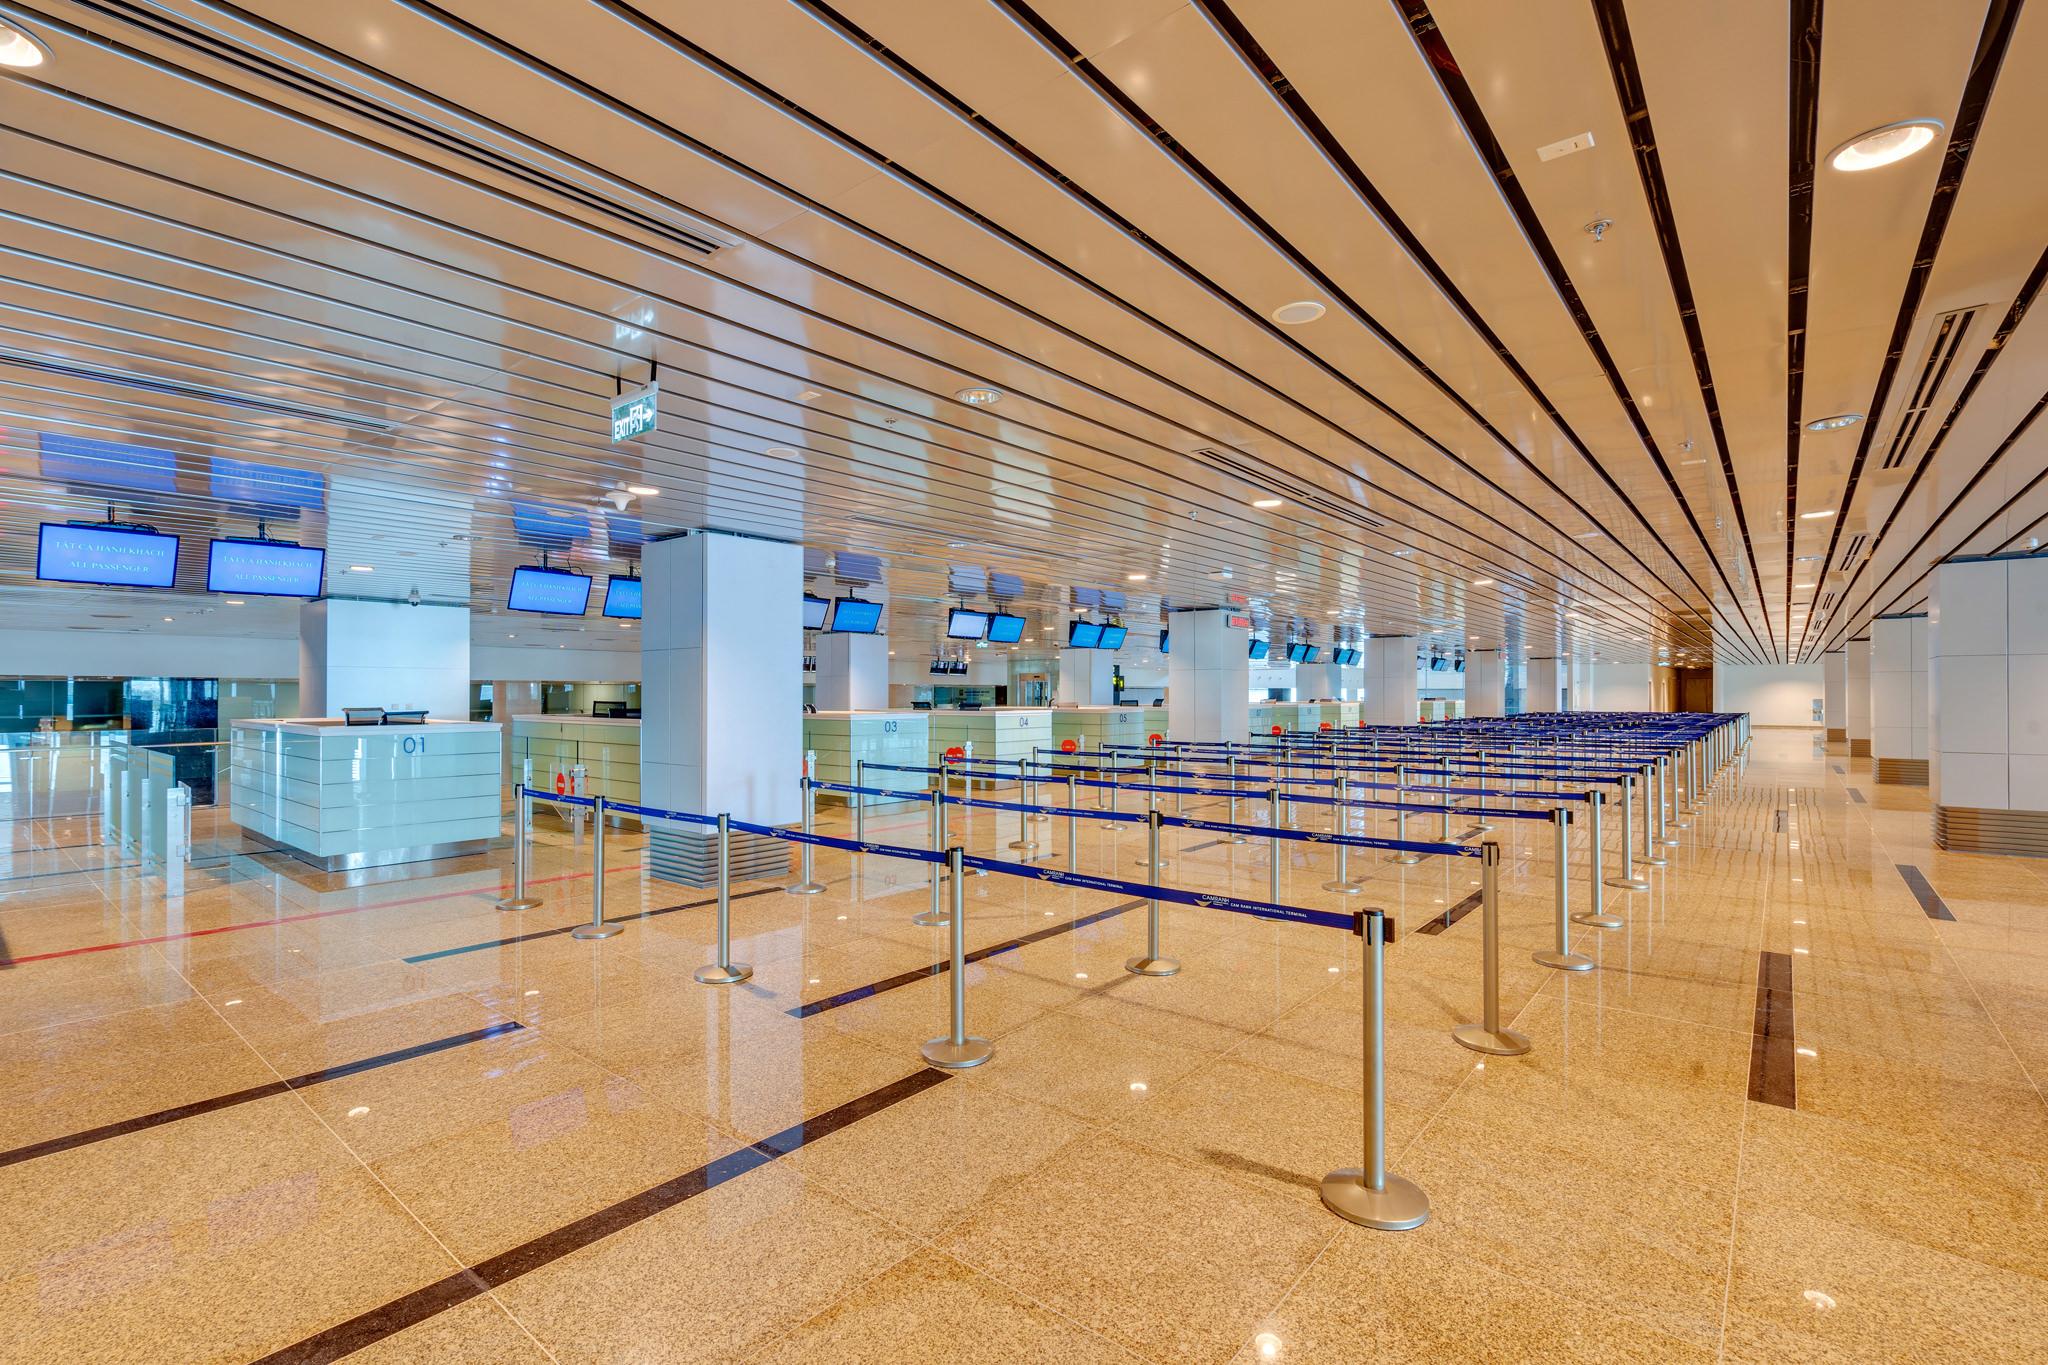 20180626 - Cam Ranh Airport - Architecture - 0149.jpg